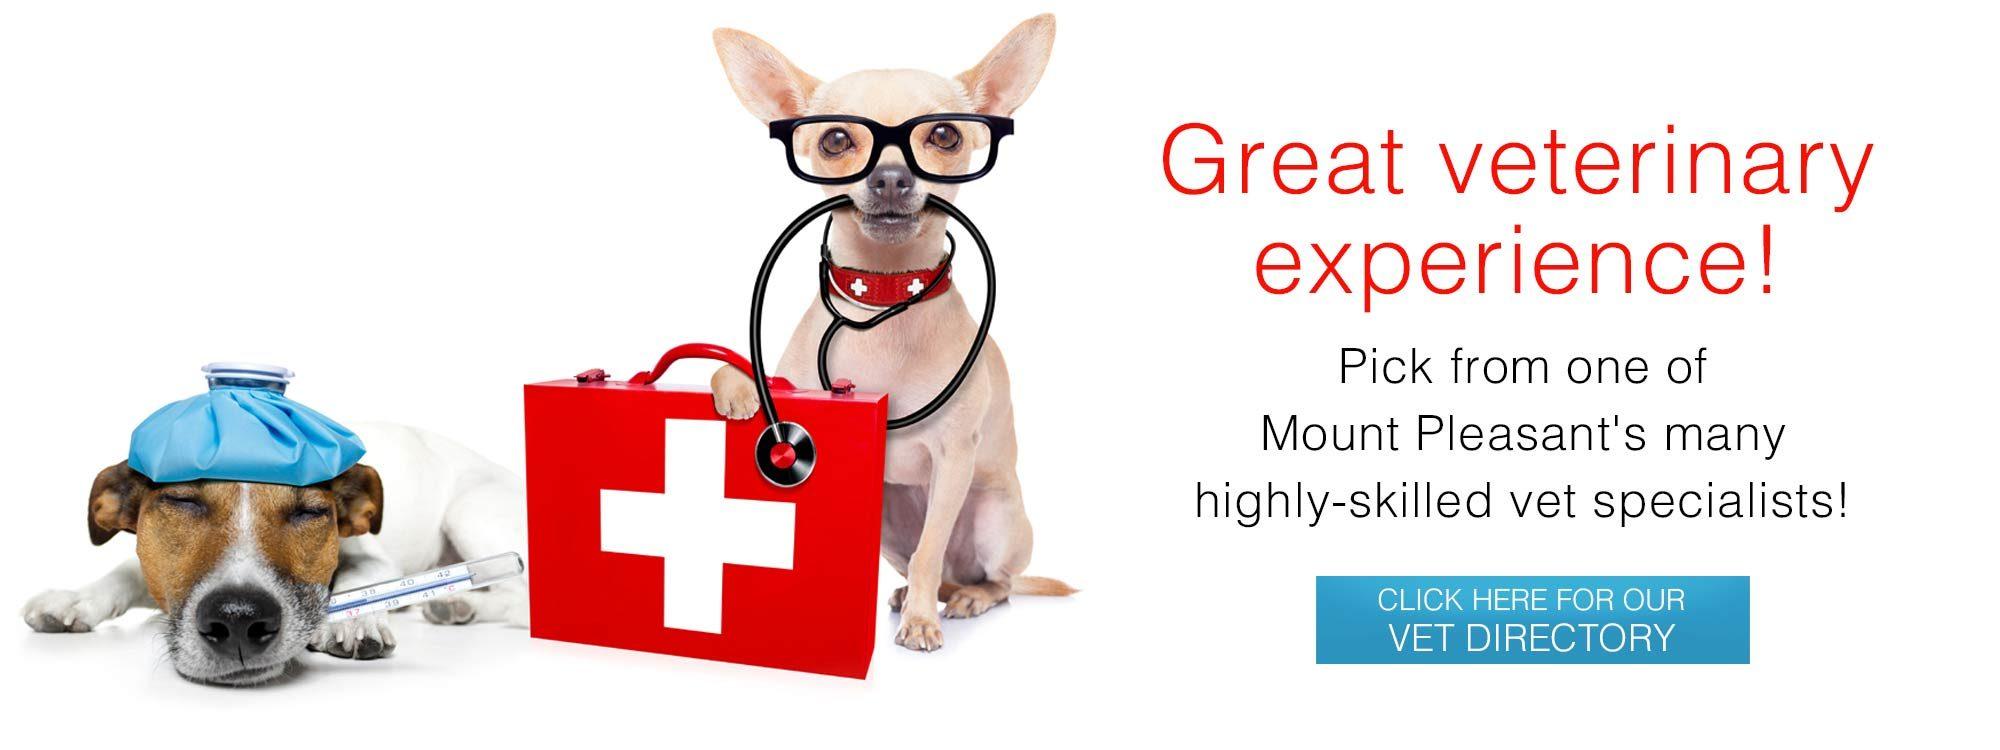 Veterinary Specialist Directory slide